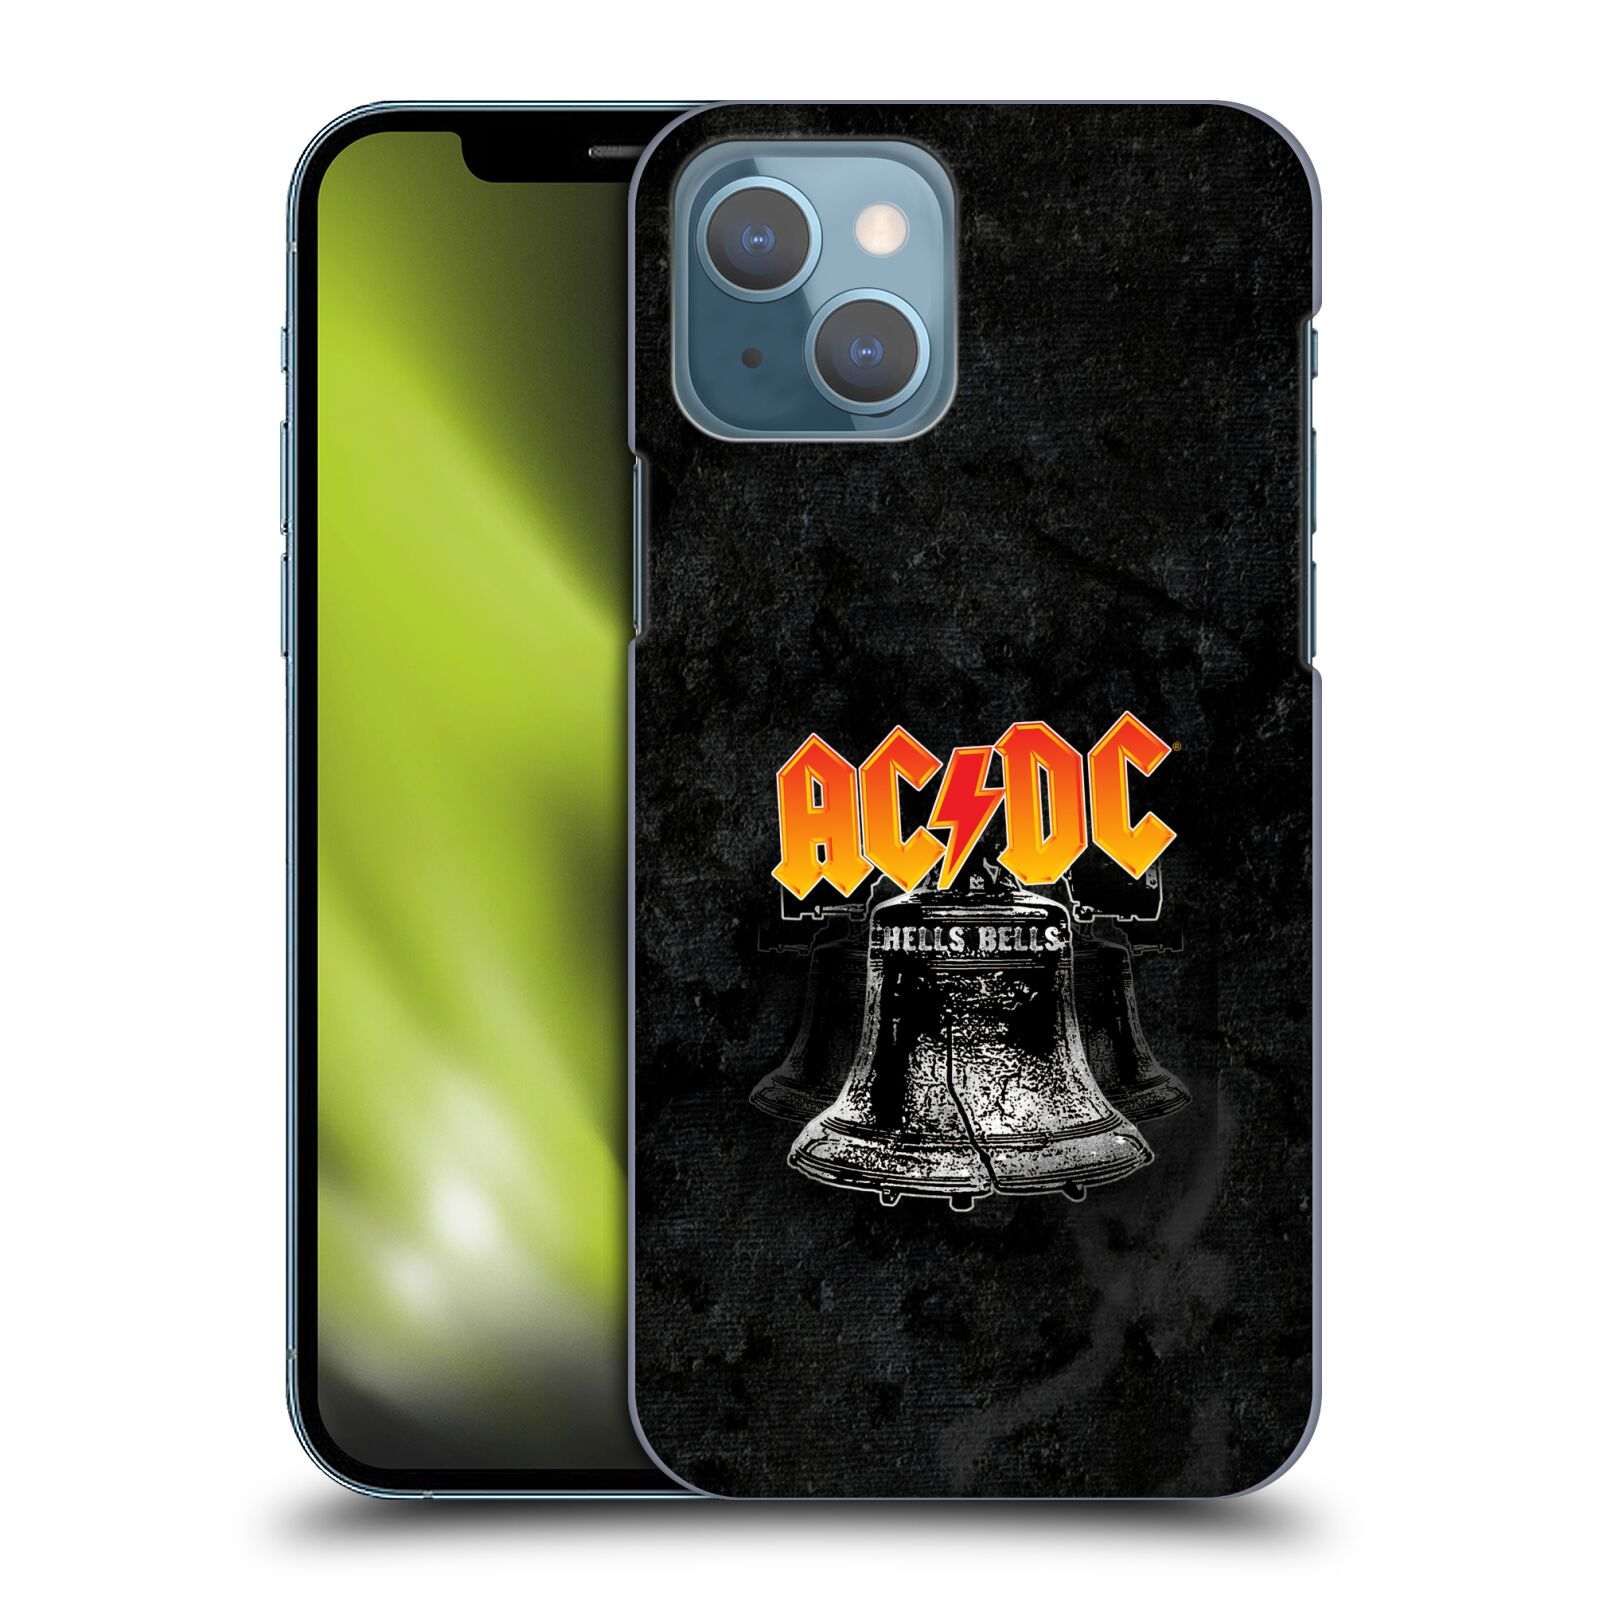 Plastové pouzdro na mobil Apple iPhone 13 - Head Case - AC/DC Hells Bells